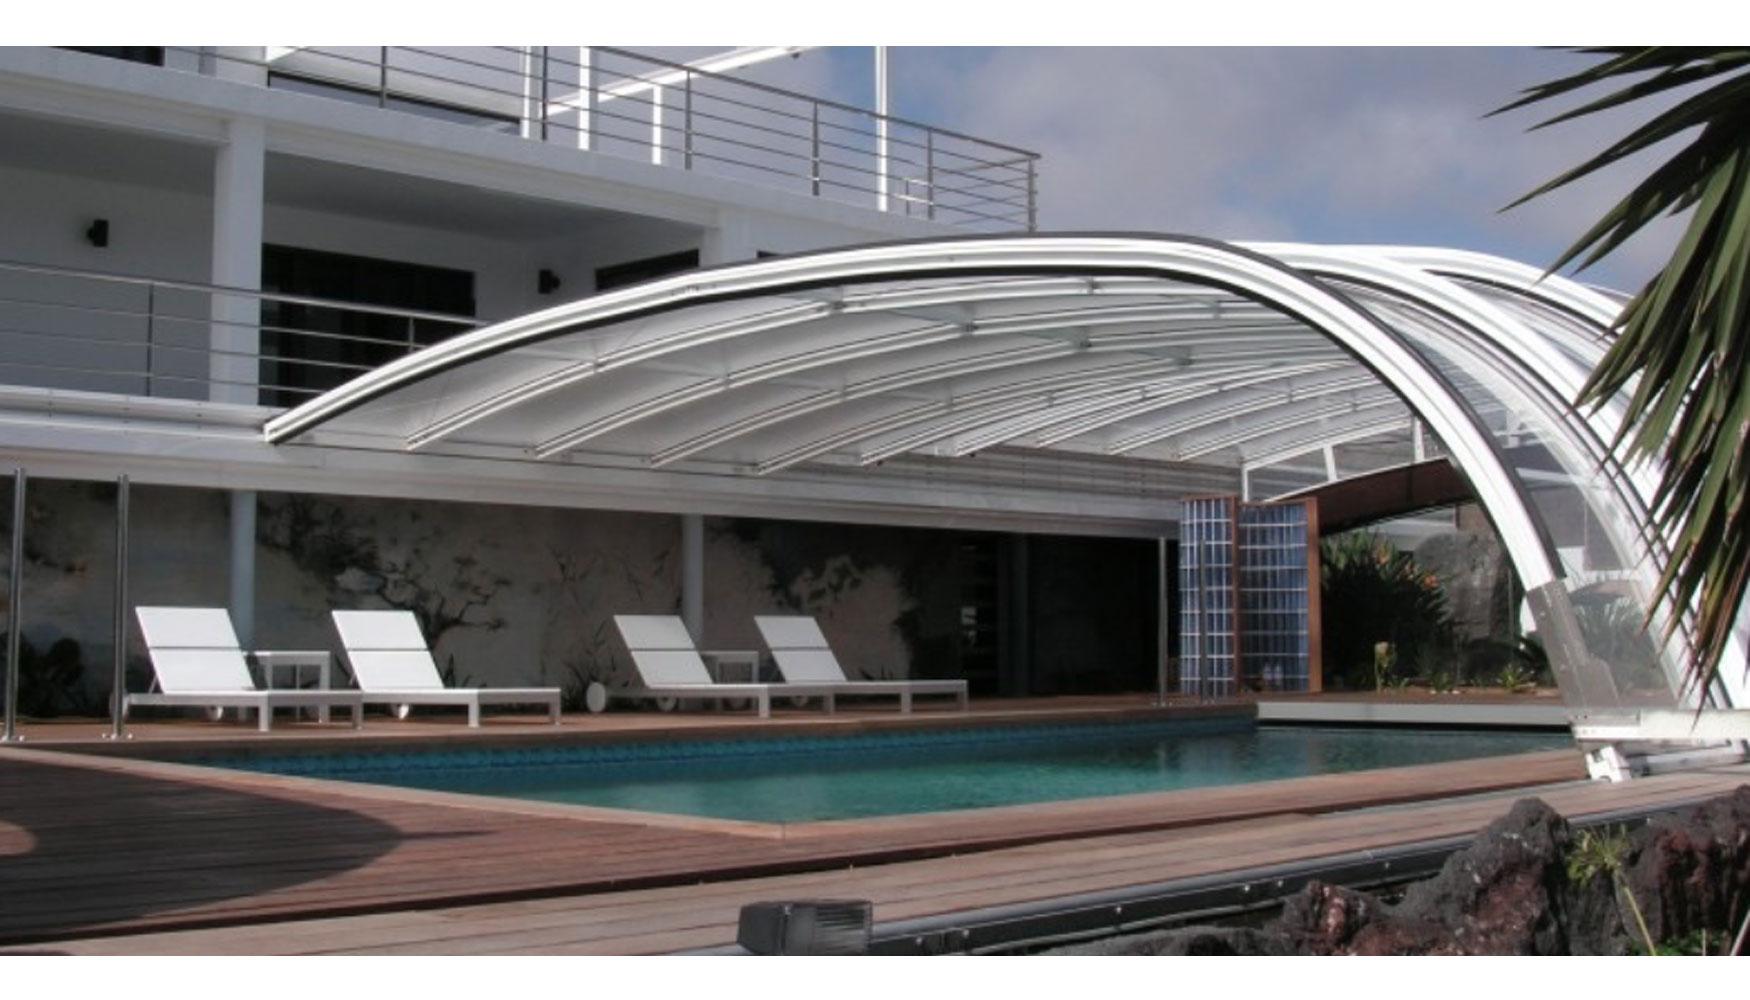 Cubiertas para piscinas de acmsa garant a de calidad y for Piscina quart de poblet cubierta